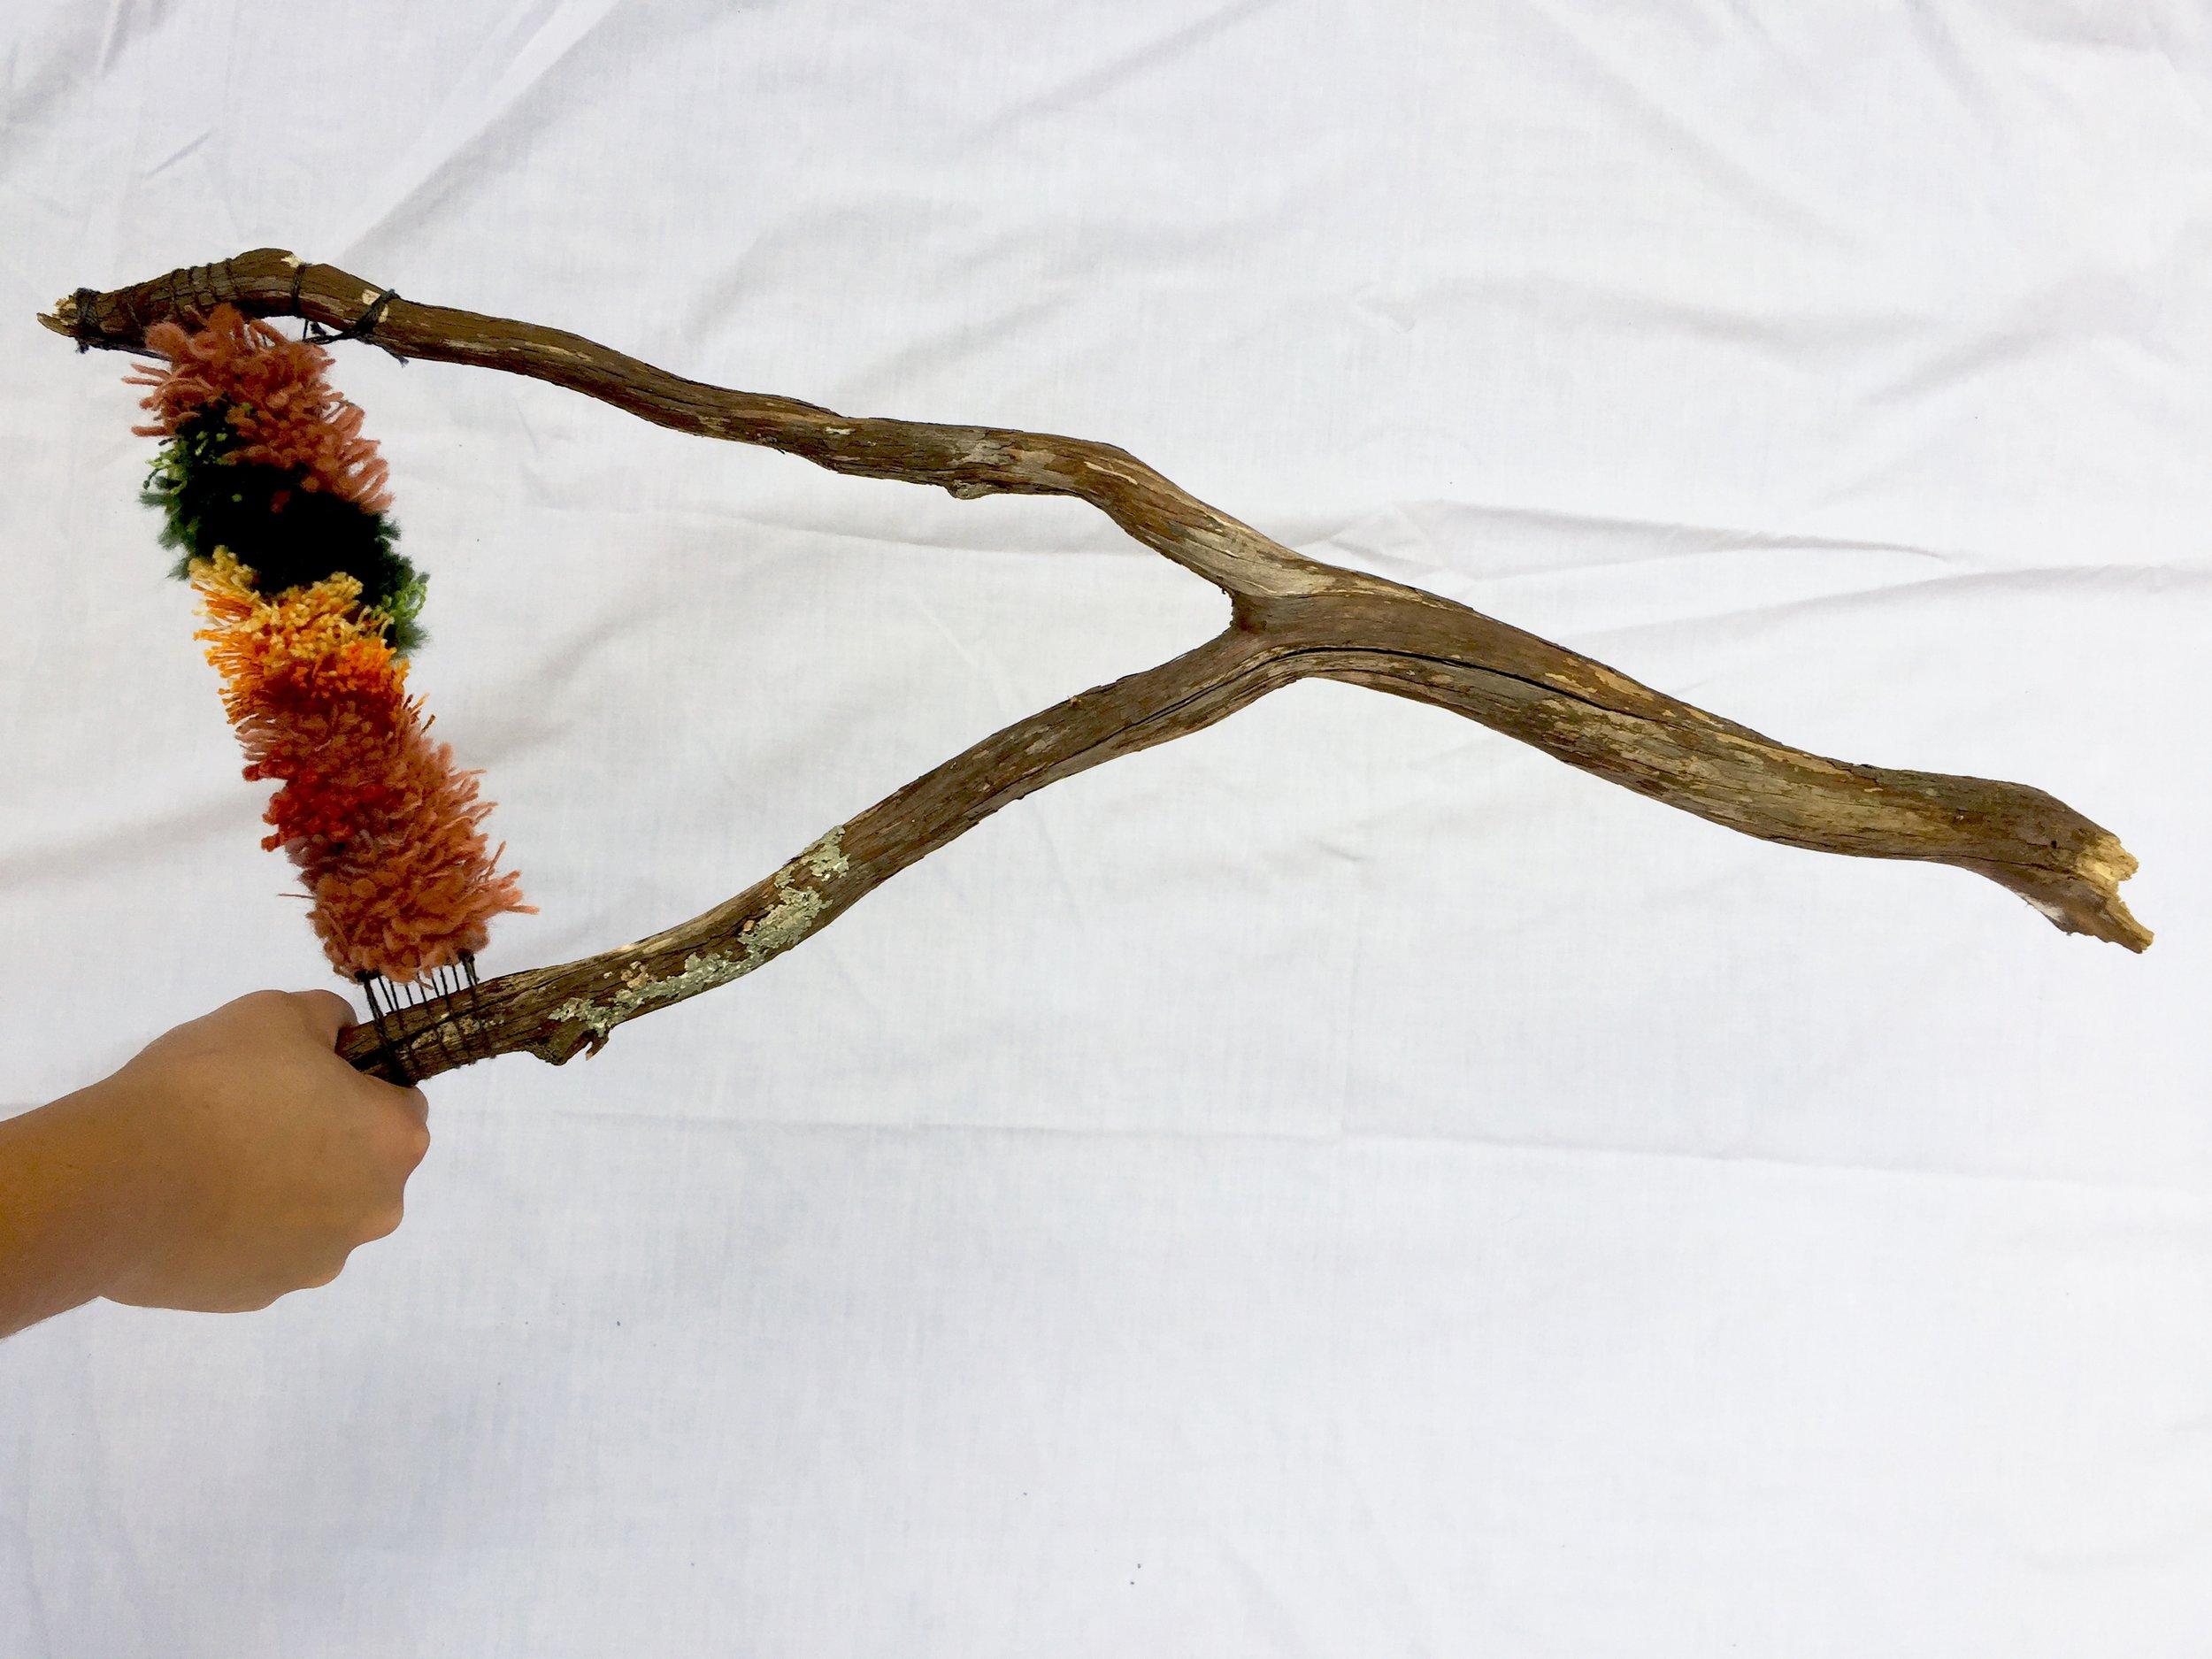 Dowsing Rod, 2017. Wood, various handspun and commercial yarns.